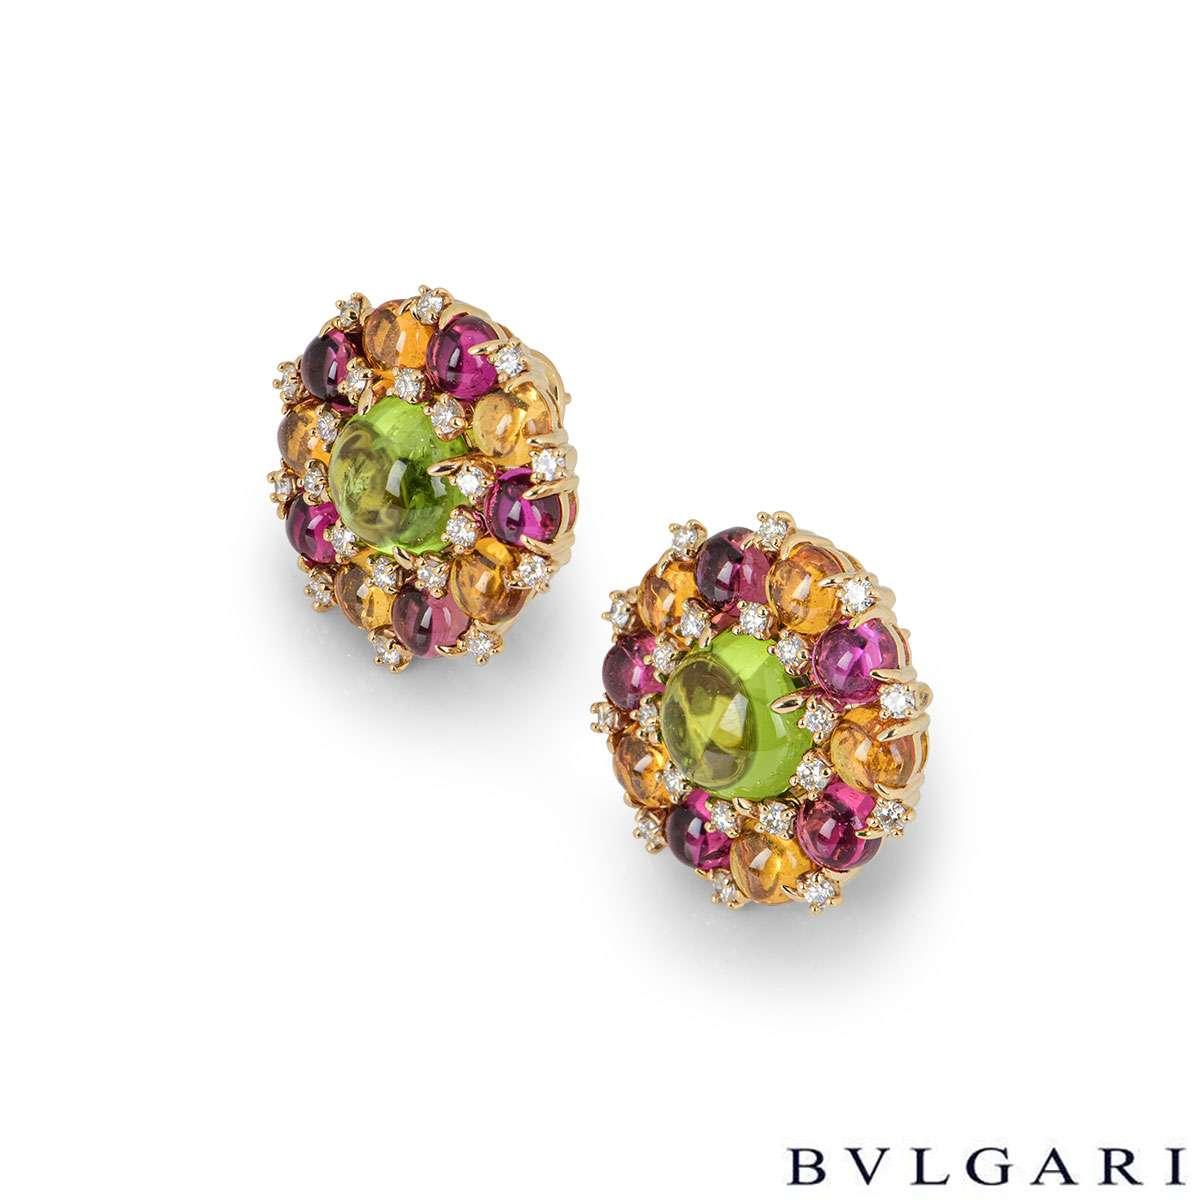 Bvlgari Rose Gold Diamond and Multi-Gemstone Earrings